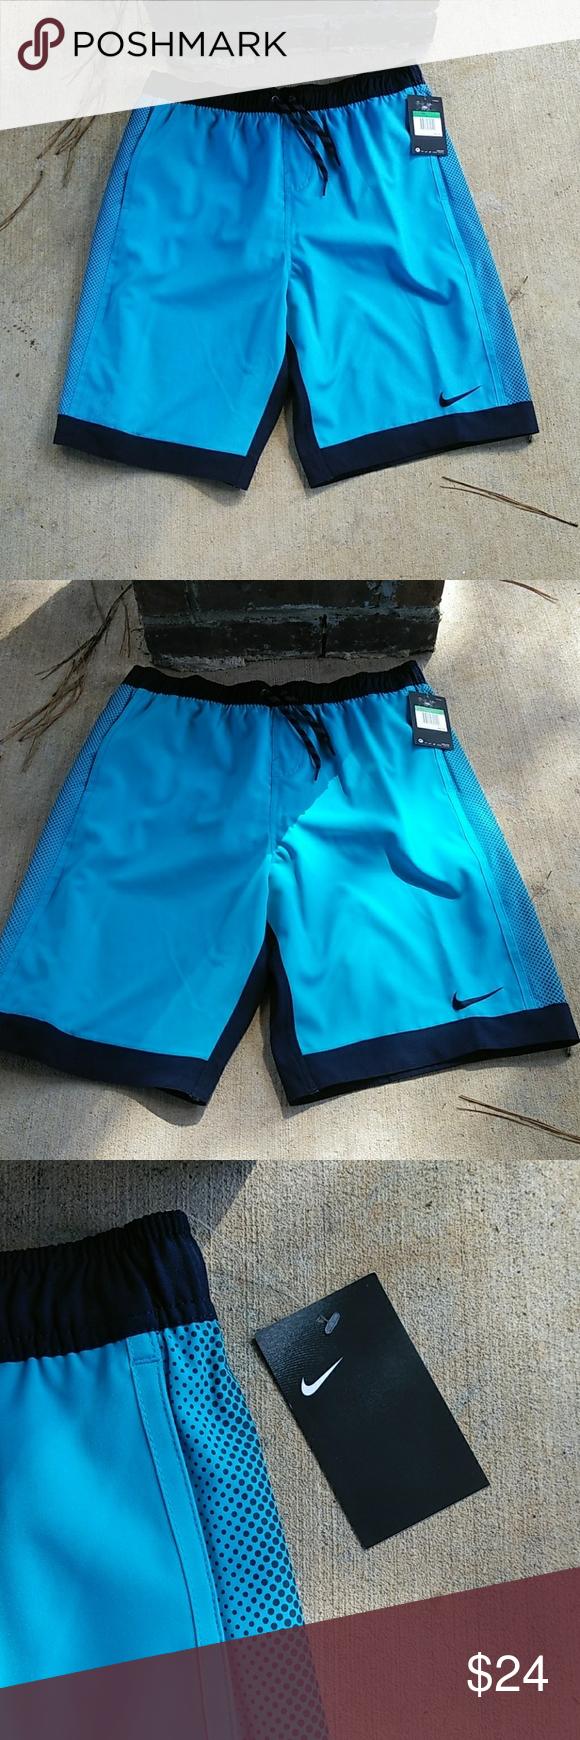 b43a24d6d9 Nike Swimwear for Men Brand New Nike Swim shorts for Men size Large Nike  Swim Swim Trunks